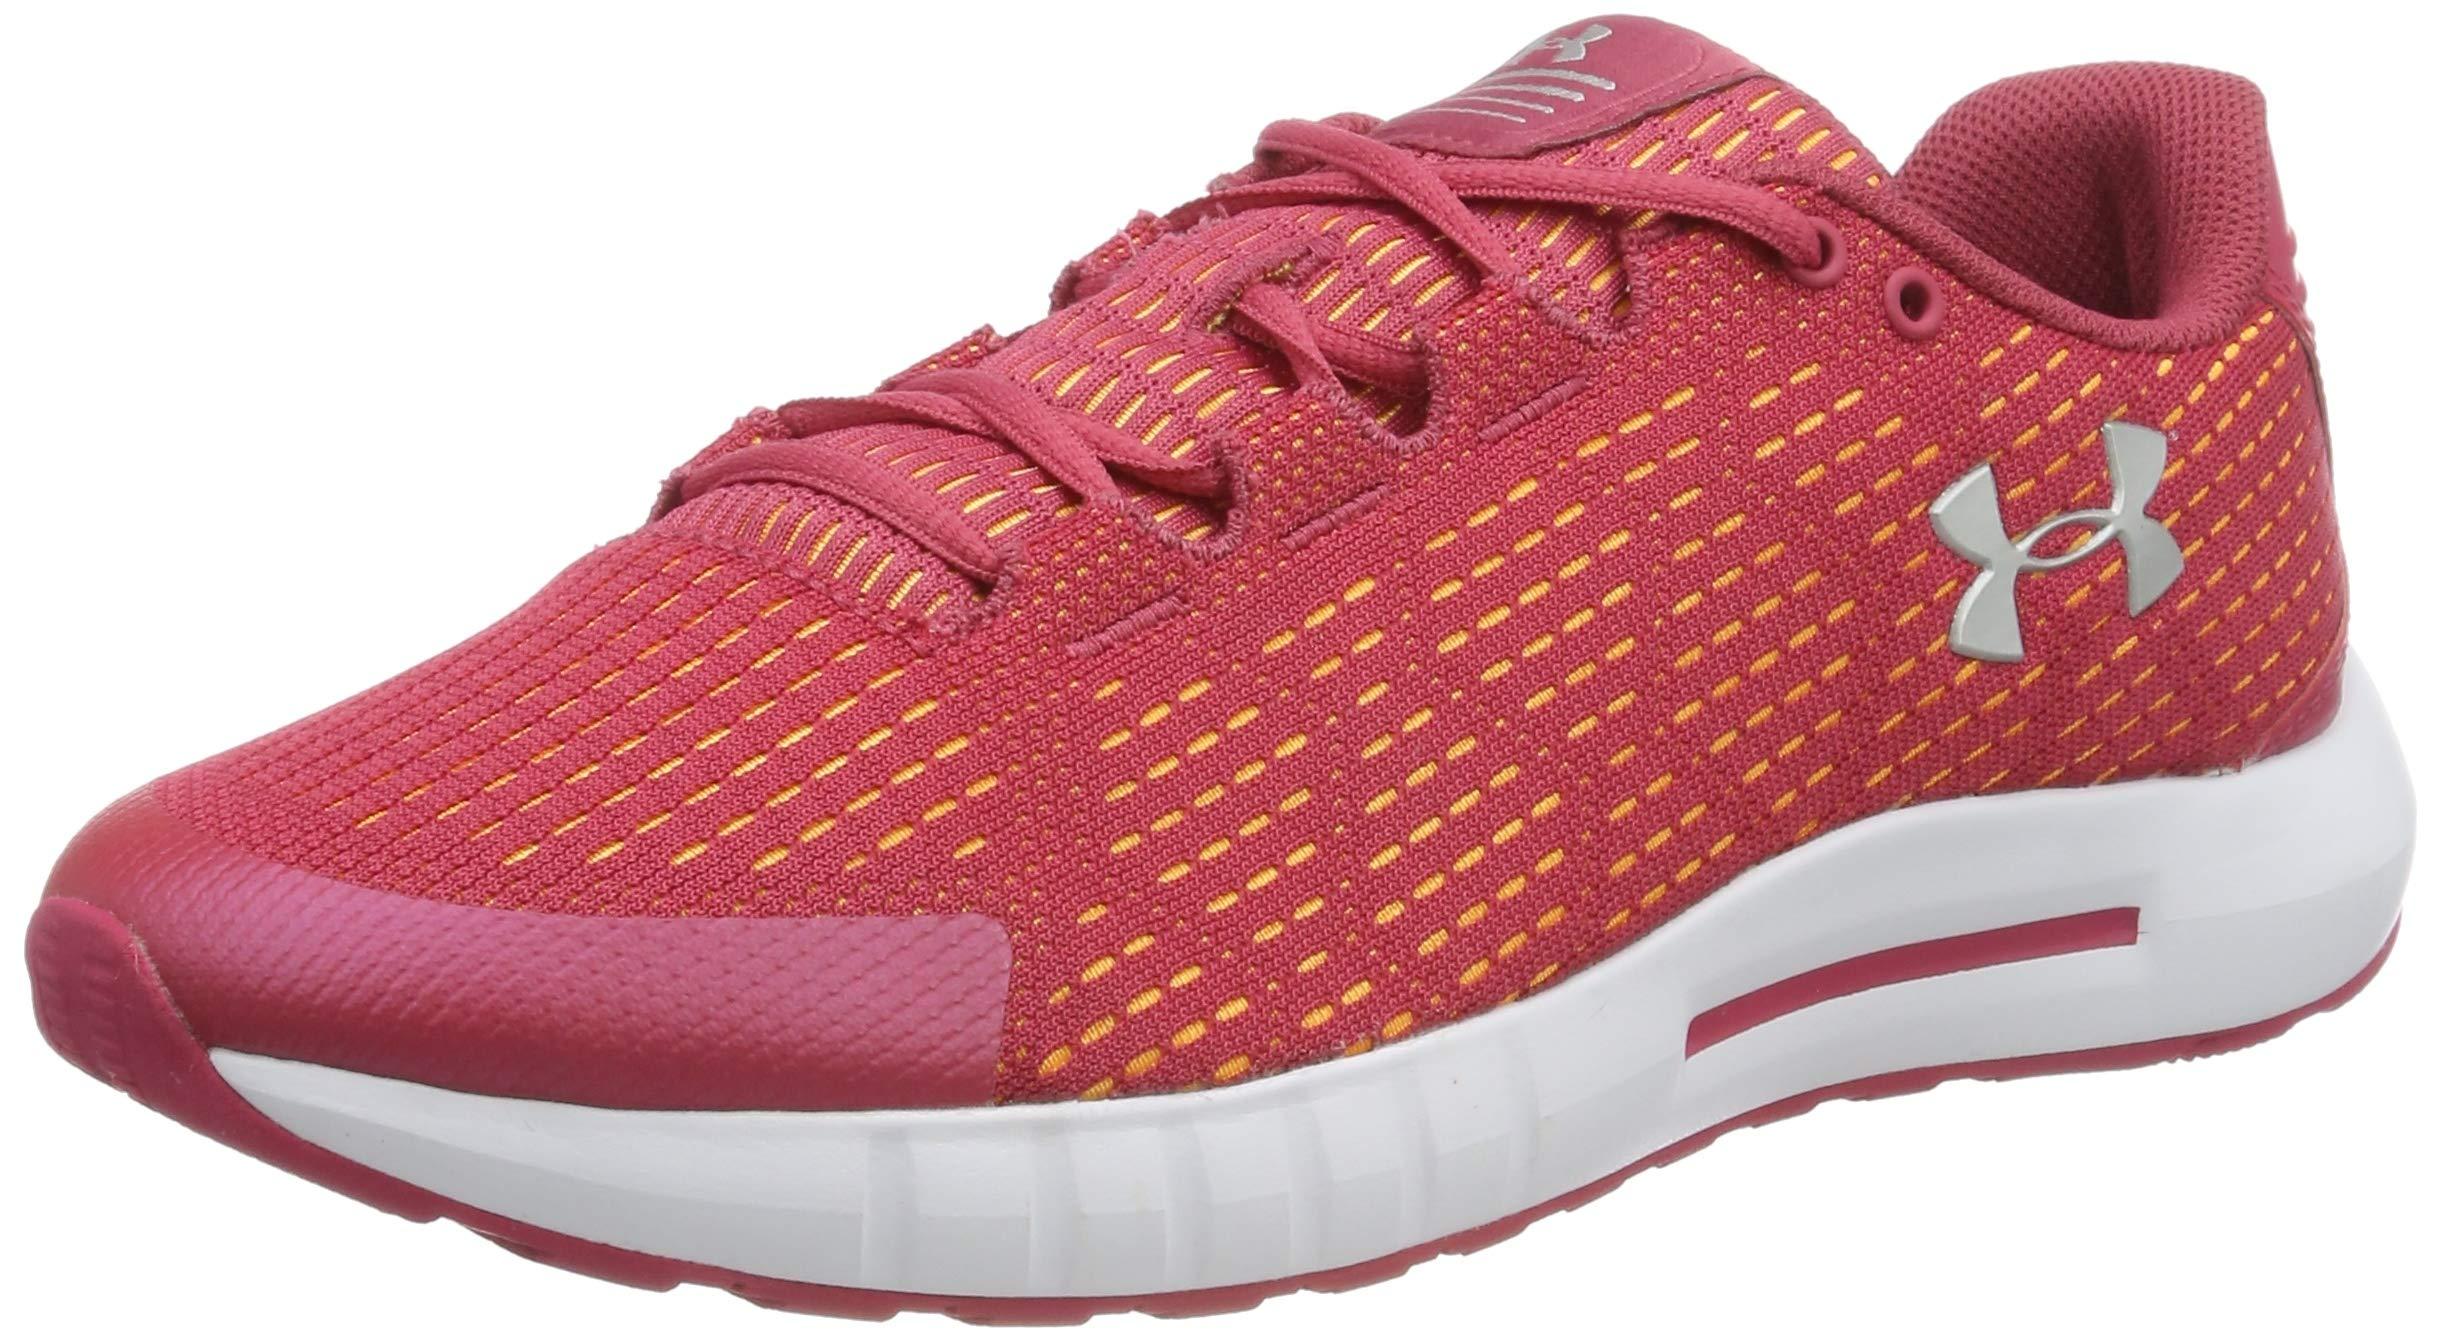 Under Armour Micro G Pursuit Se, Zapatillas de Running para Mujer, Rosa (Impulse PinkWhiteMetallic Silver 600), 40 EU Mejores Precios